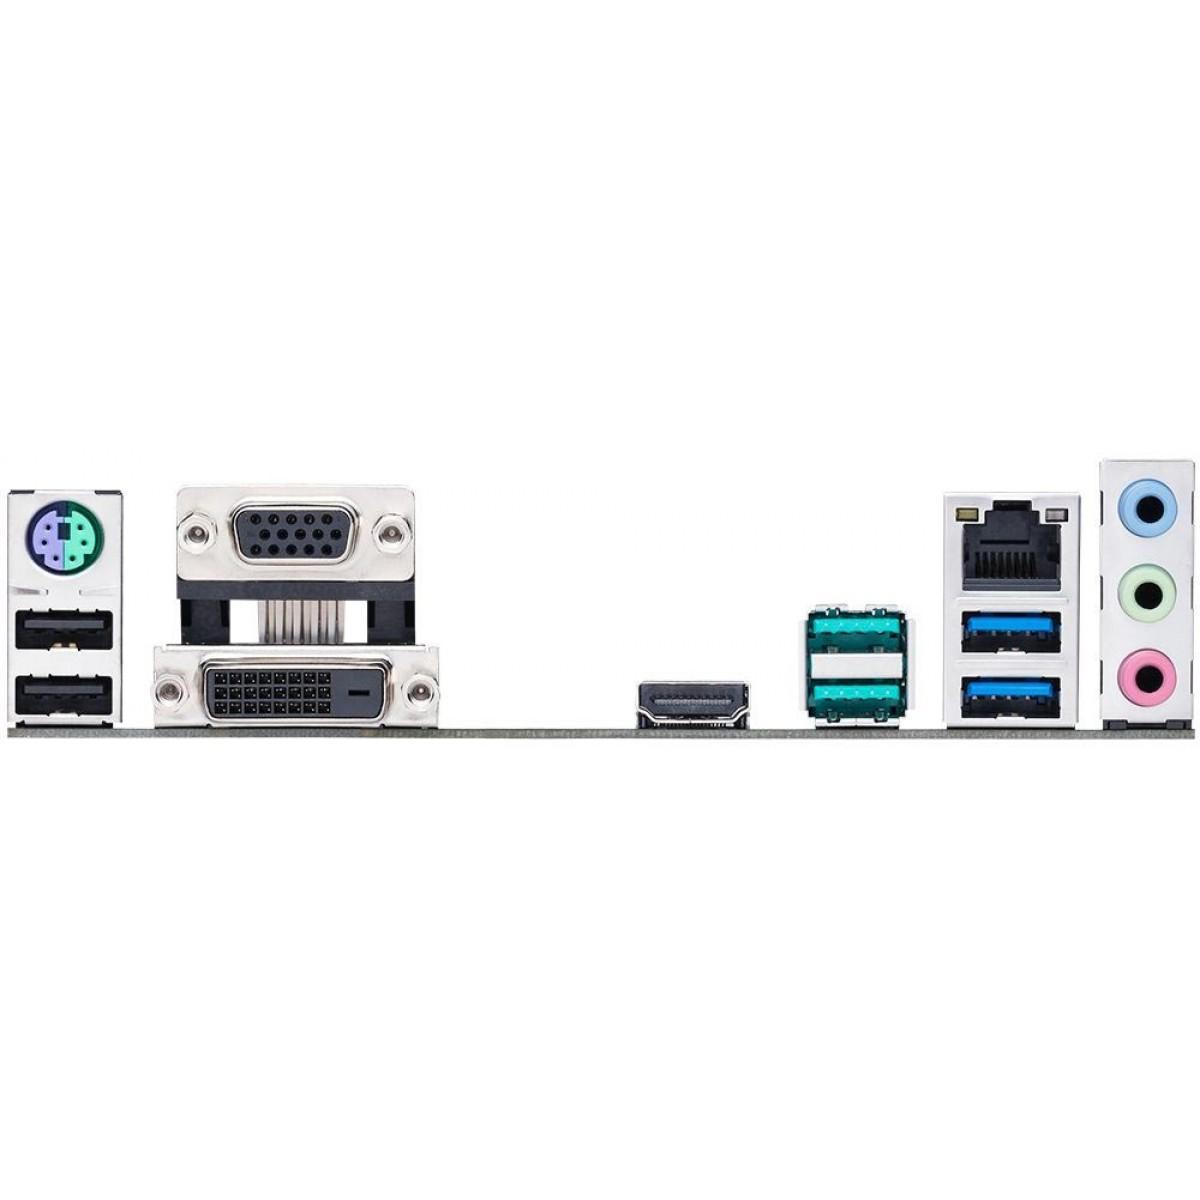 Placa Mãe Asus Prime H370-A, Chipset H370, Intel LGA 1151, ATX, DDR4